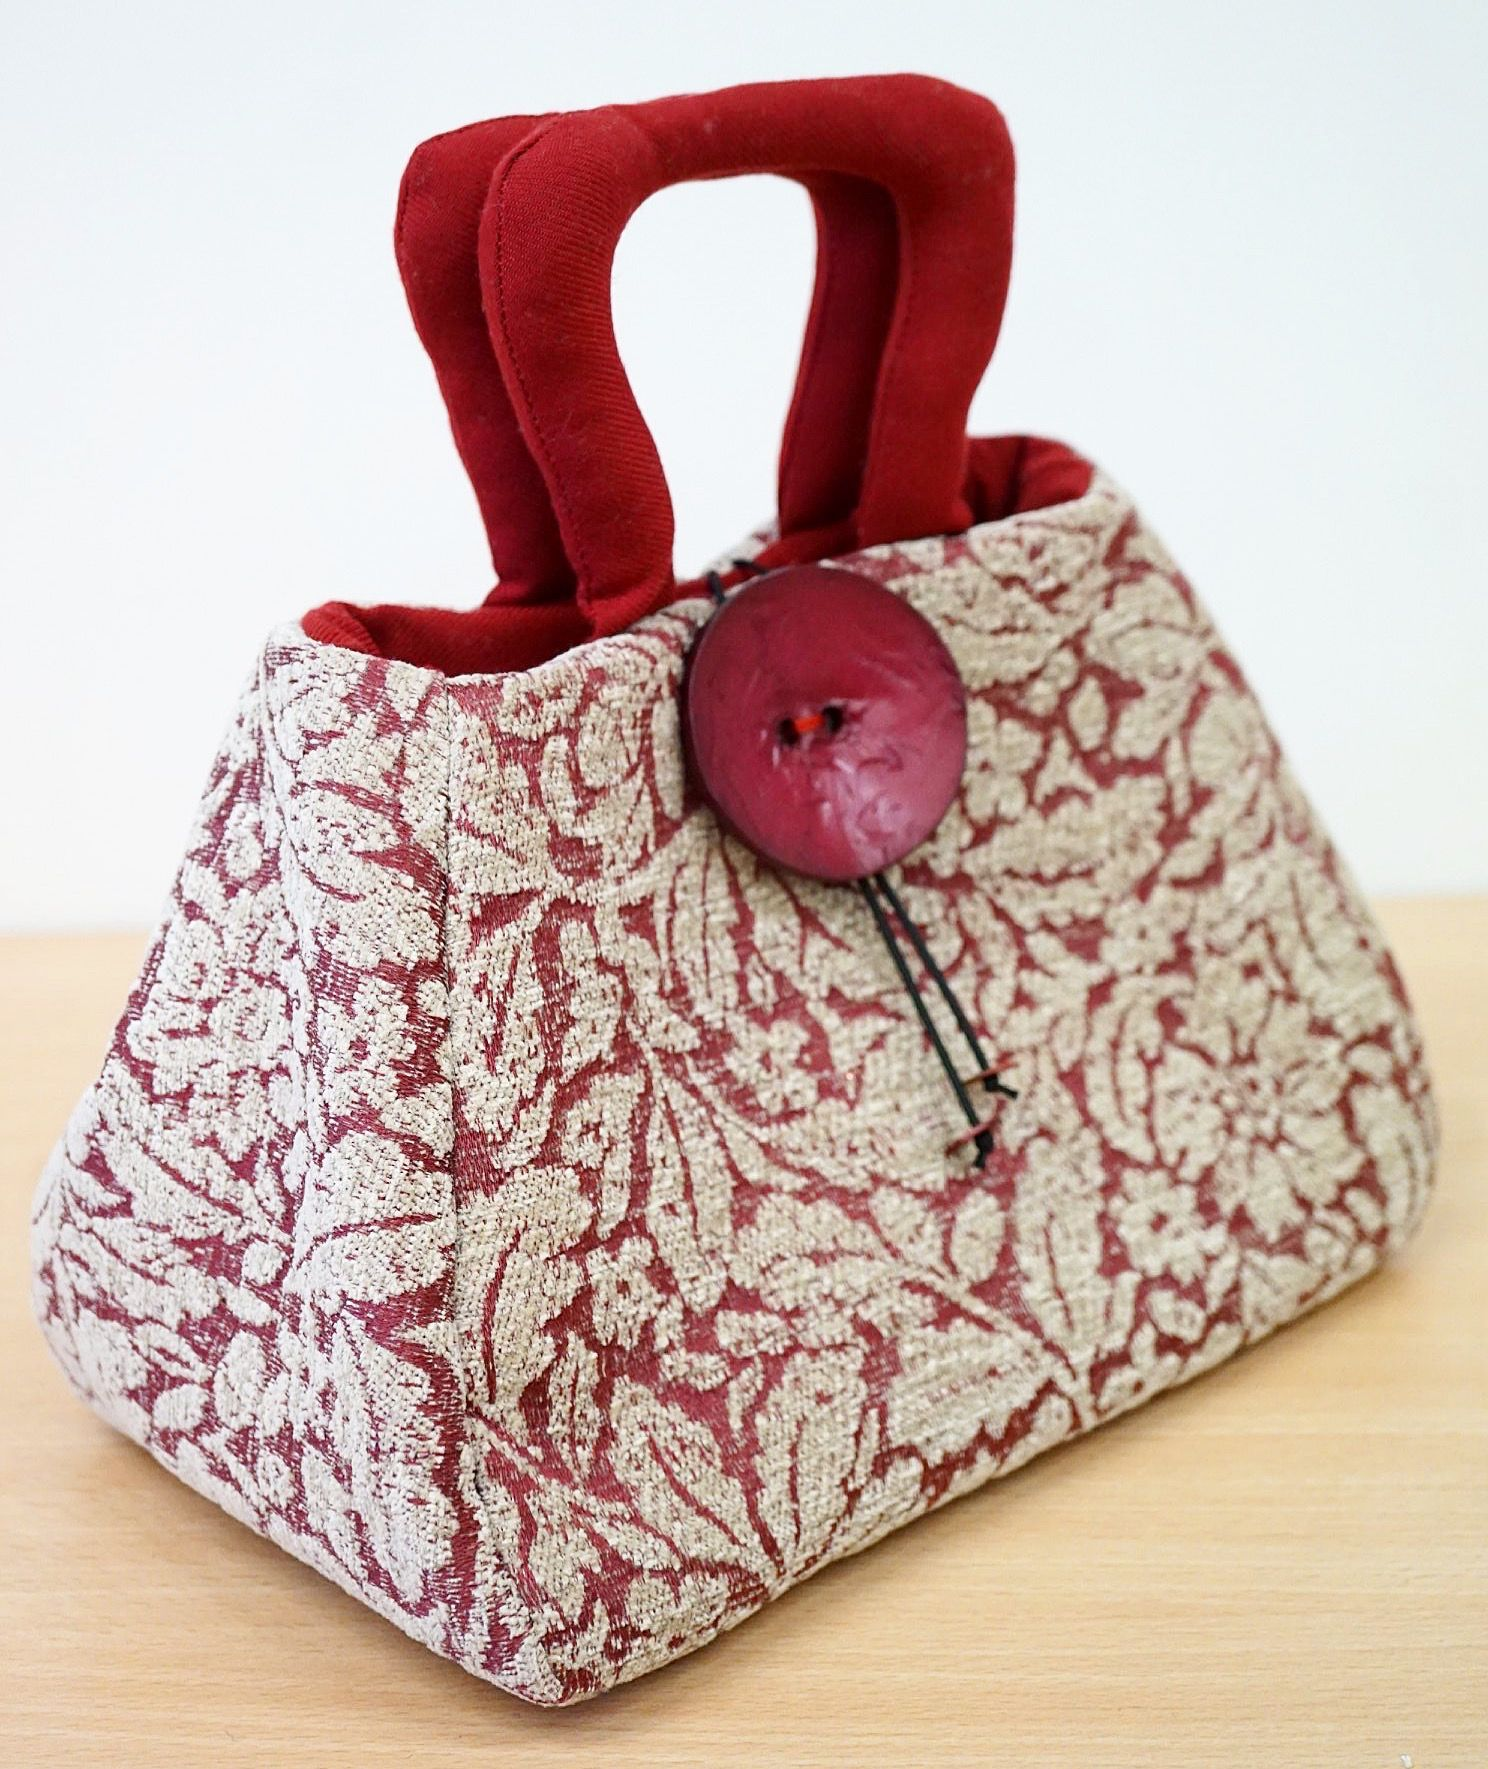 Оживим скучную сумочку своими руками